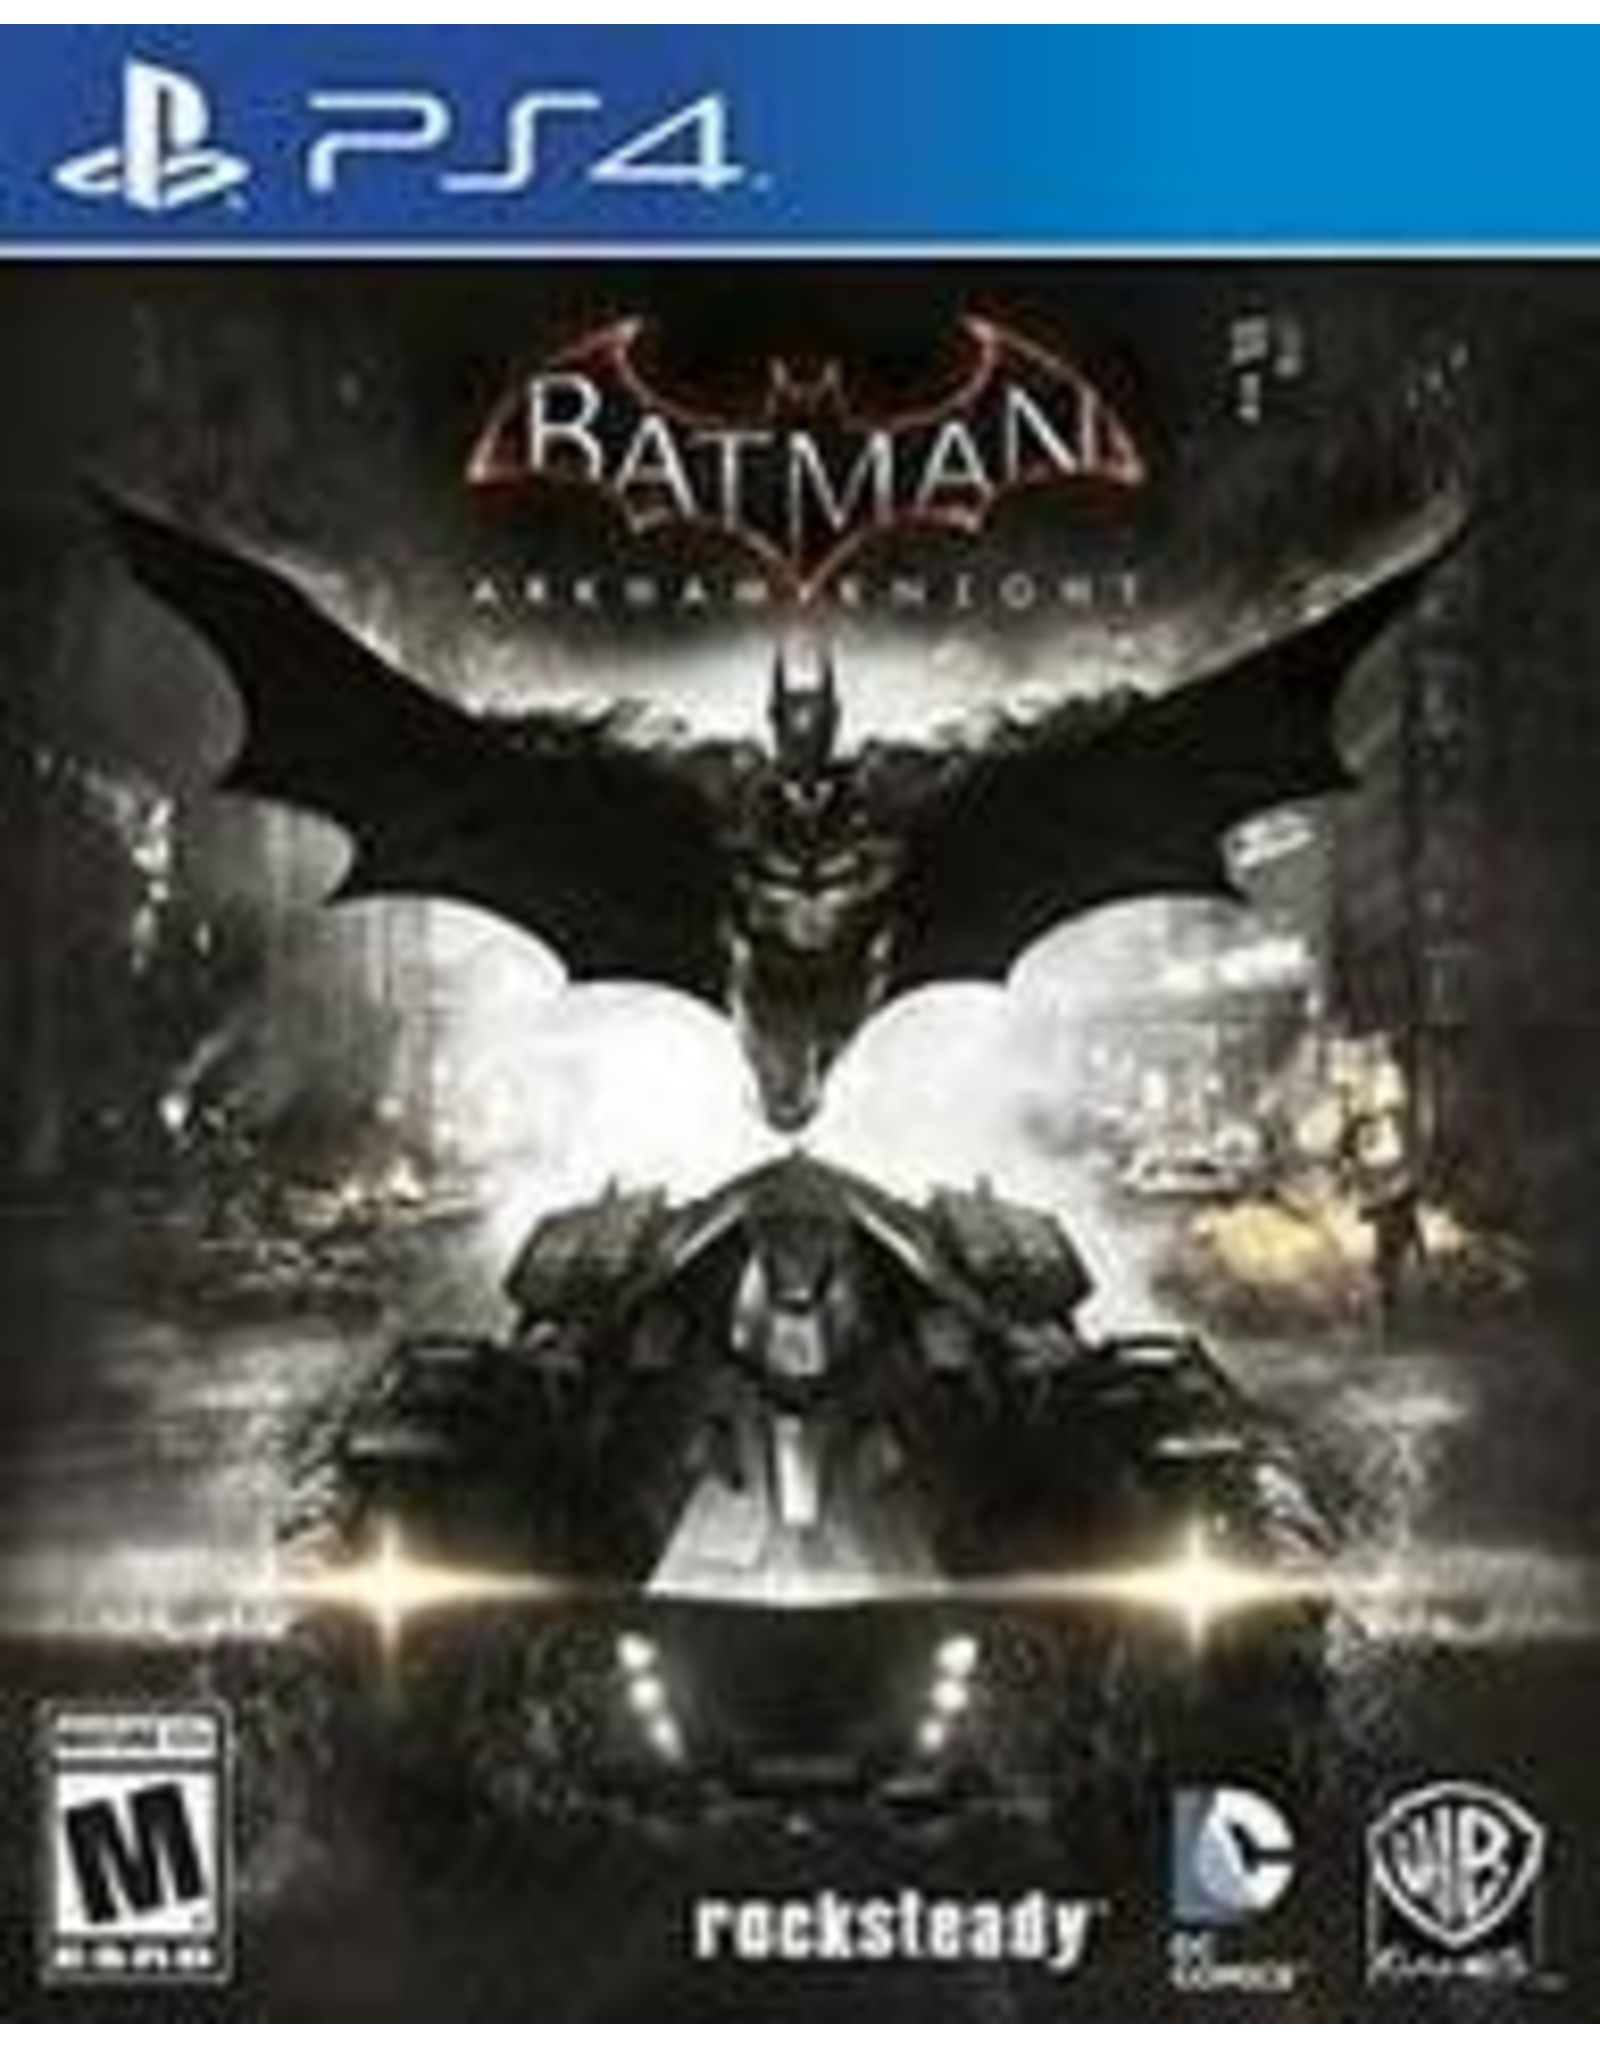 Playstation 4 Batman: Arkham Knight (CiB)